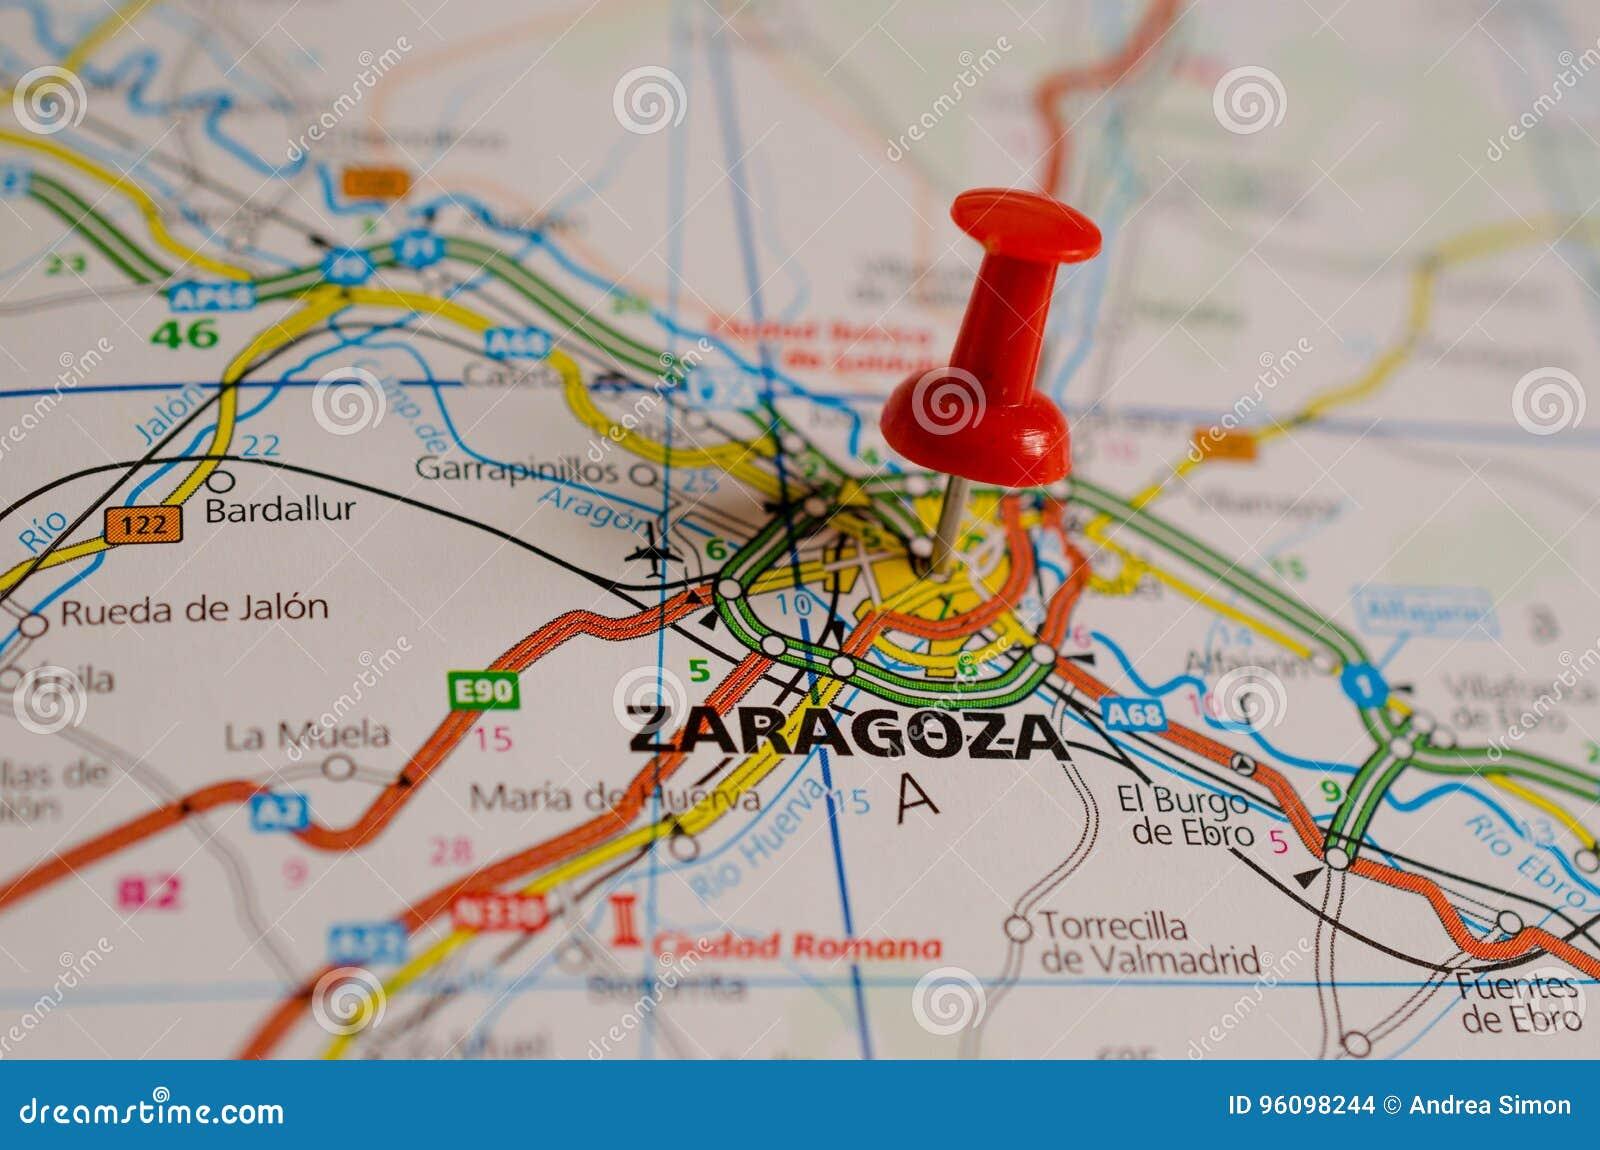 Map Of Spain Zaragoza.Zaragoza On Map Stock Photo Image Of Visit Madrid Tourism 96098244